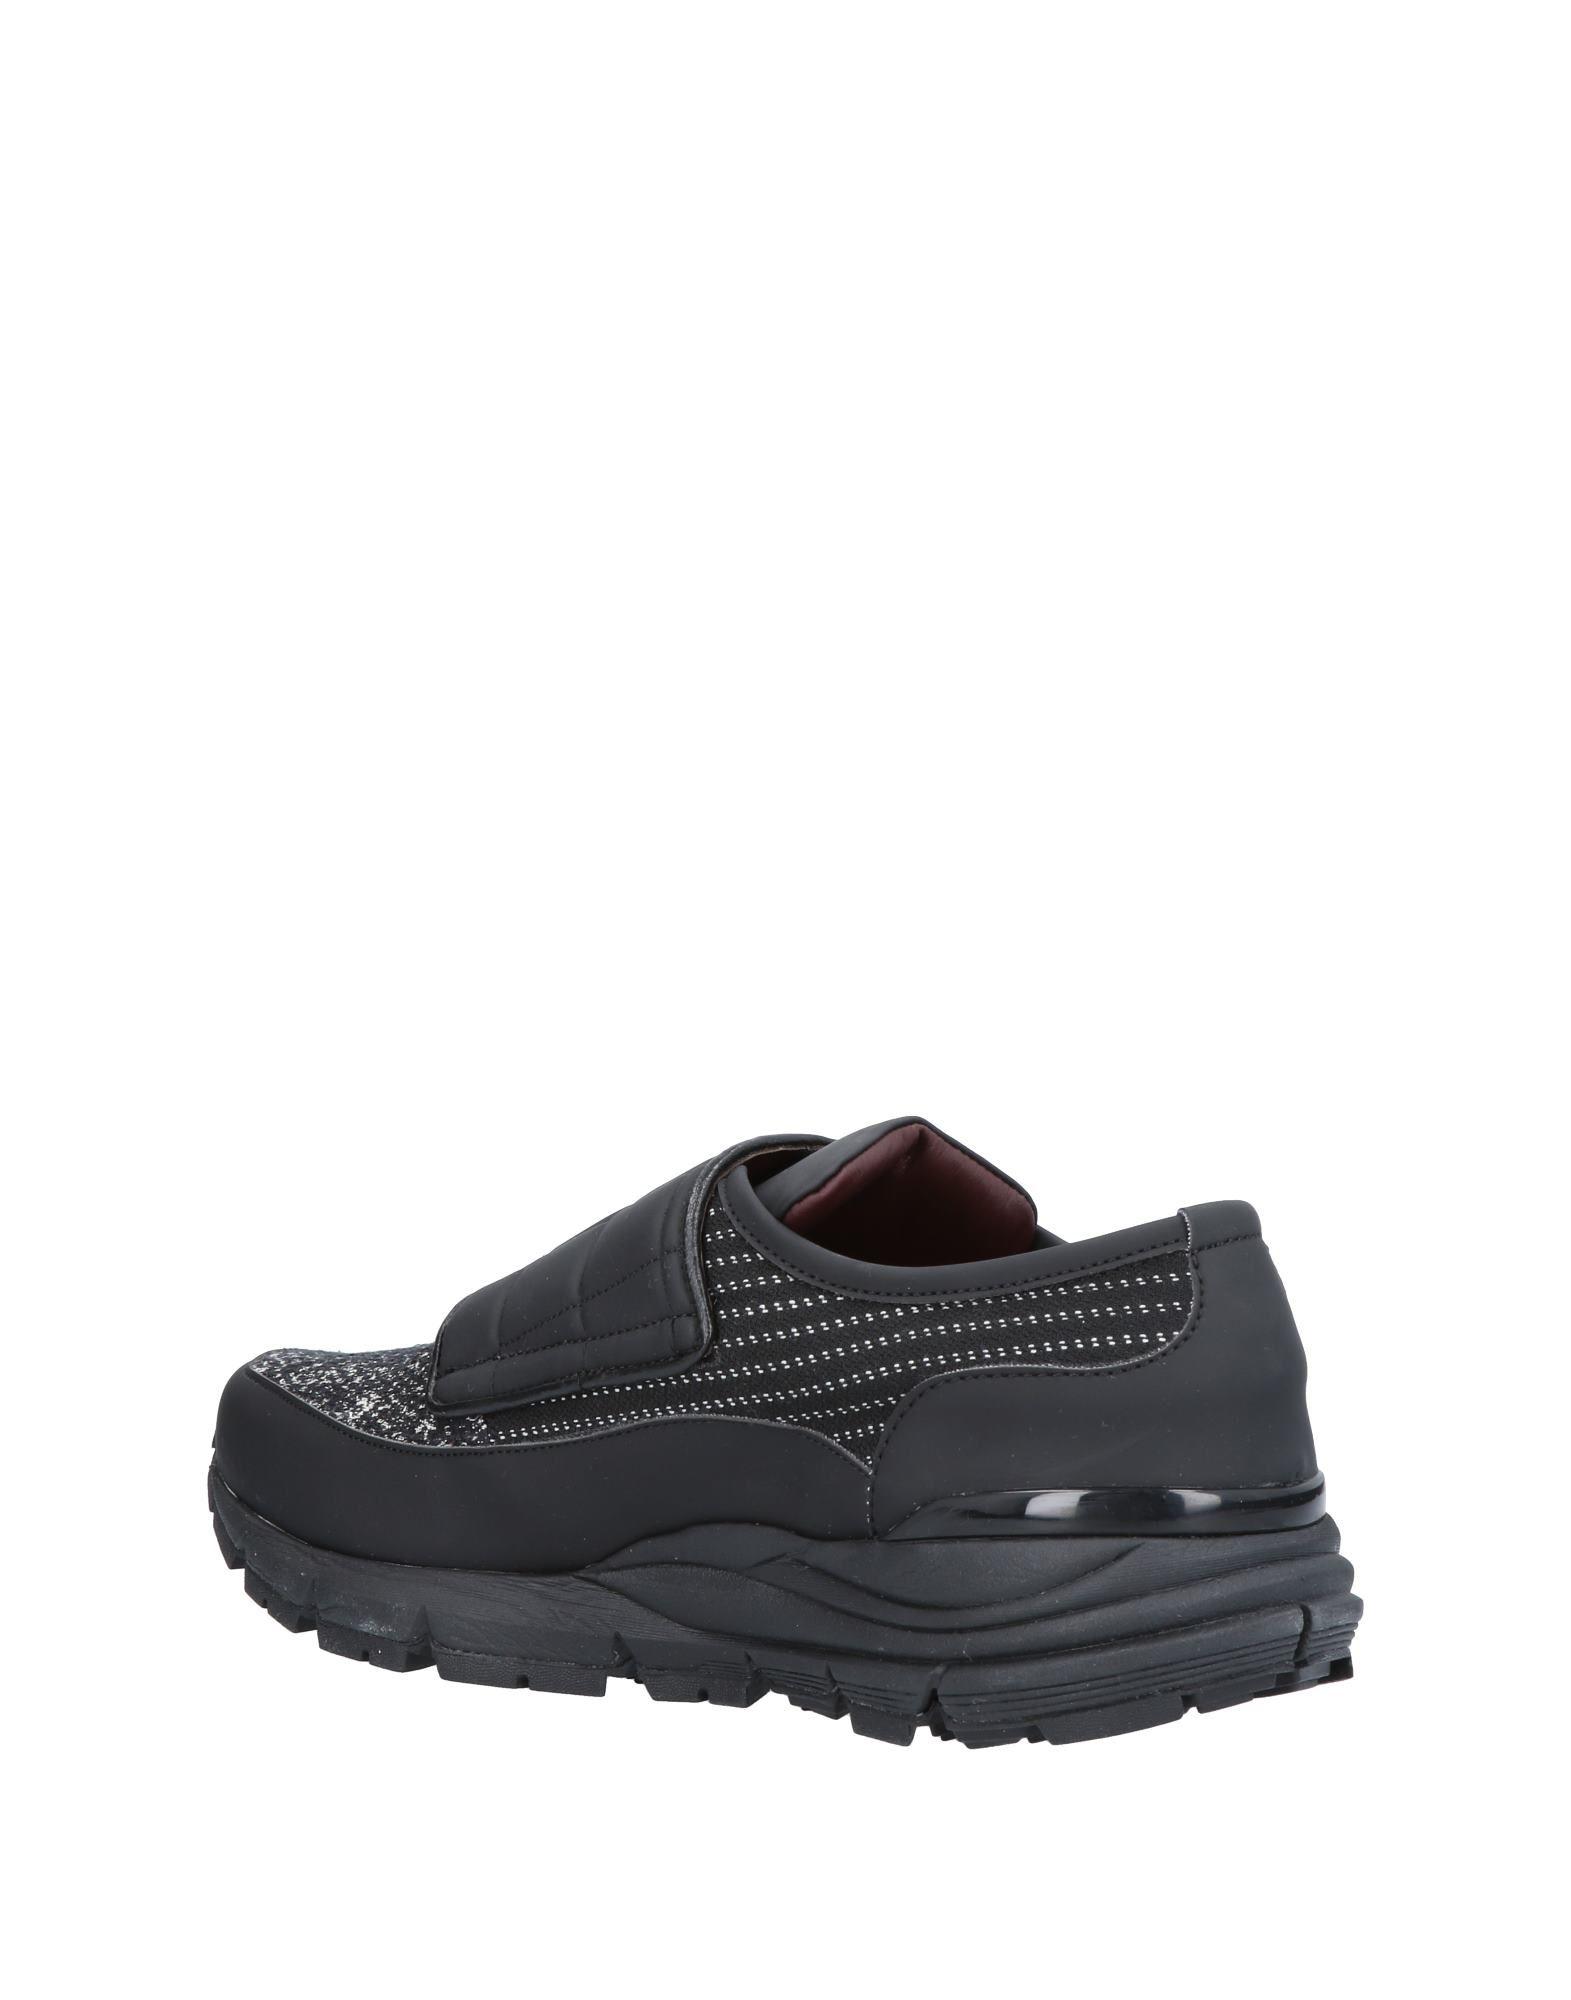 Antonio Marras 11467396OE Sneakers Damen  11467396OE Marras Neue Schuhe 144936